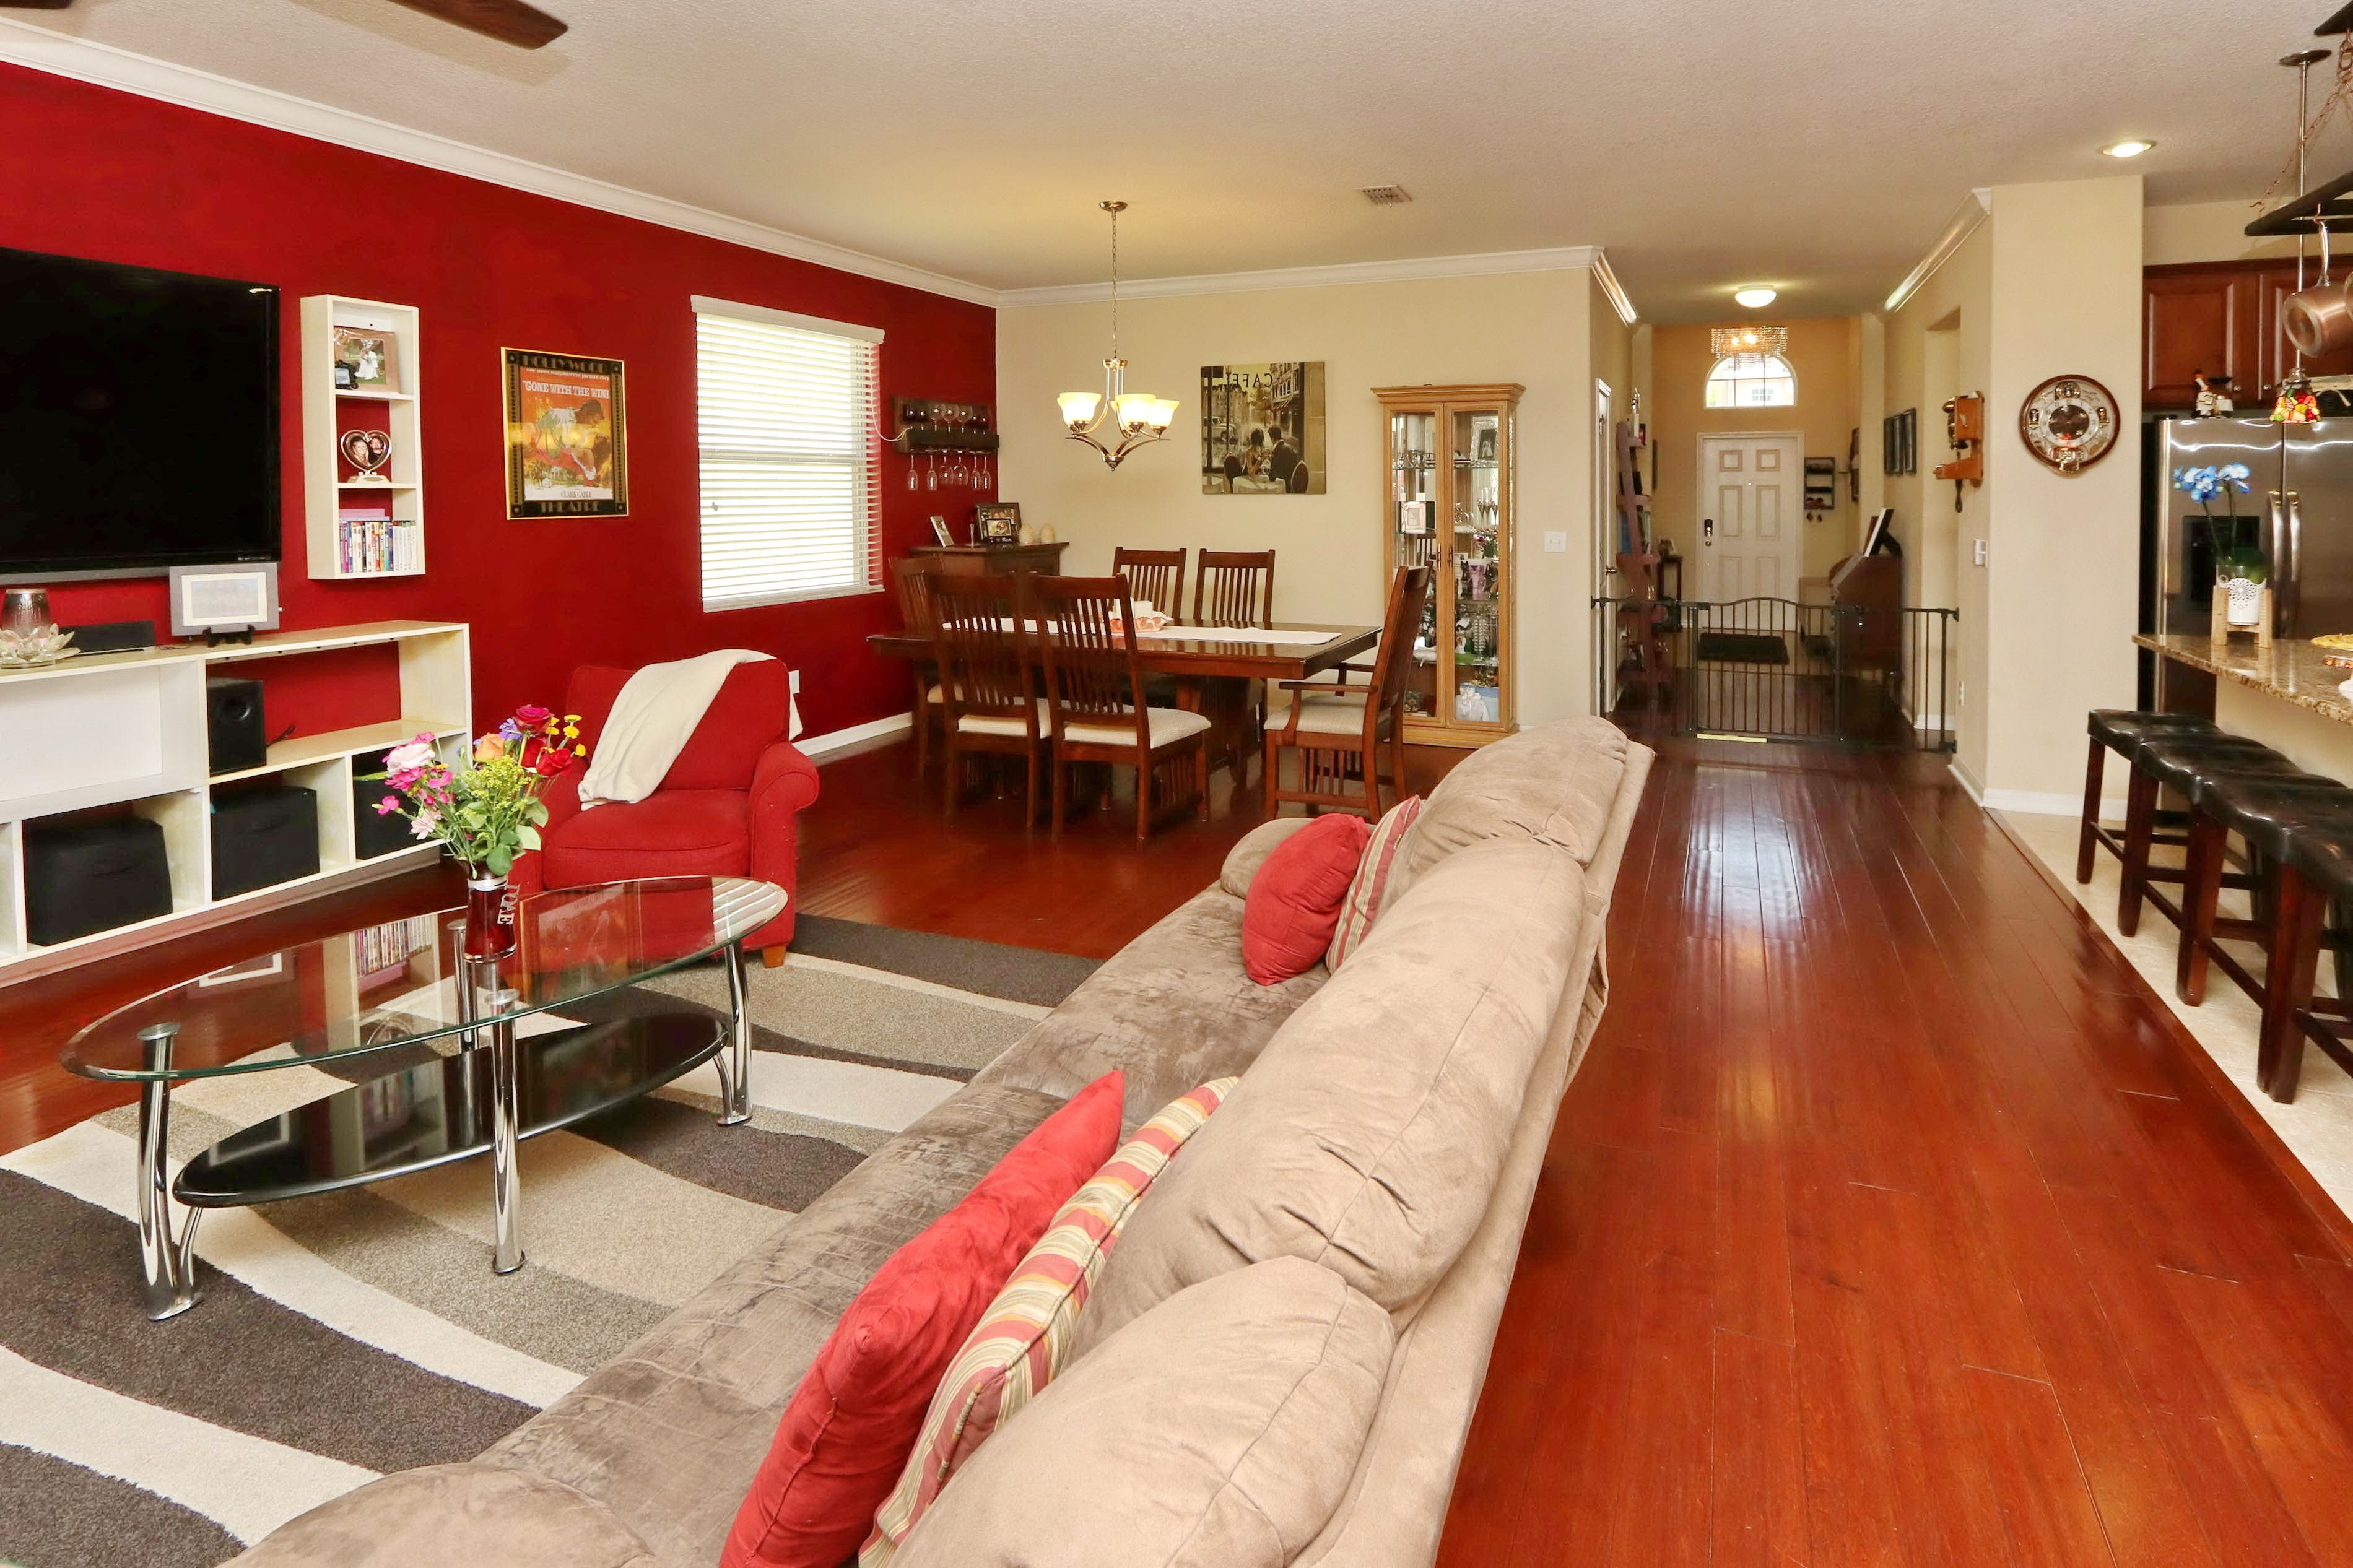 Four Bedroom Two Bath home sporting wood flooring, granite